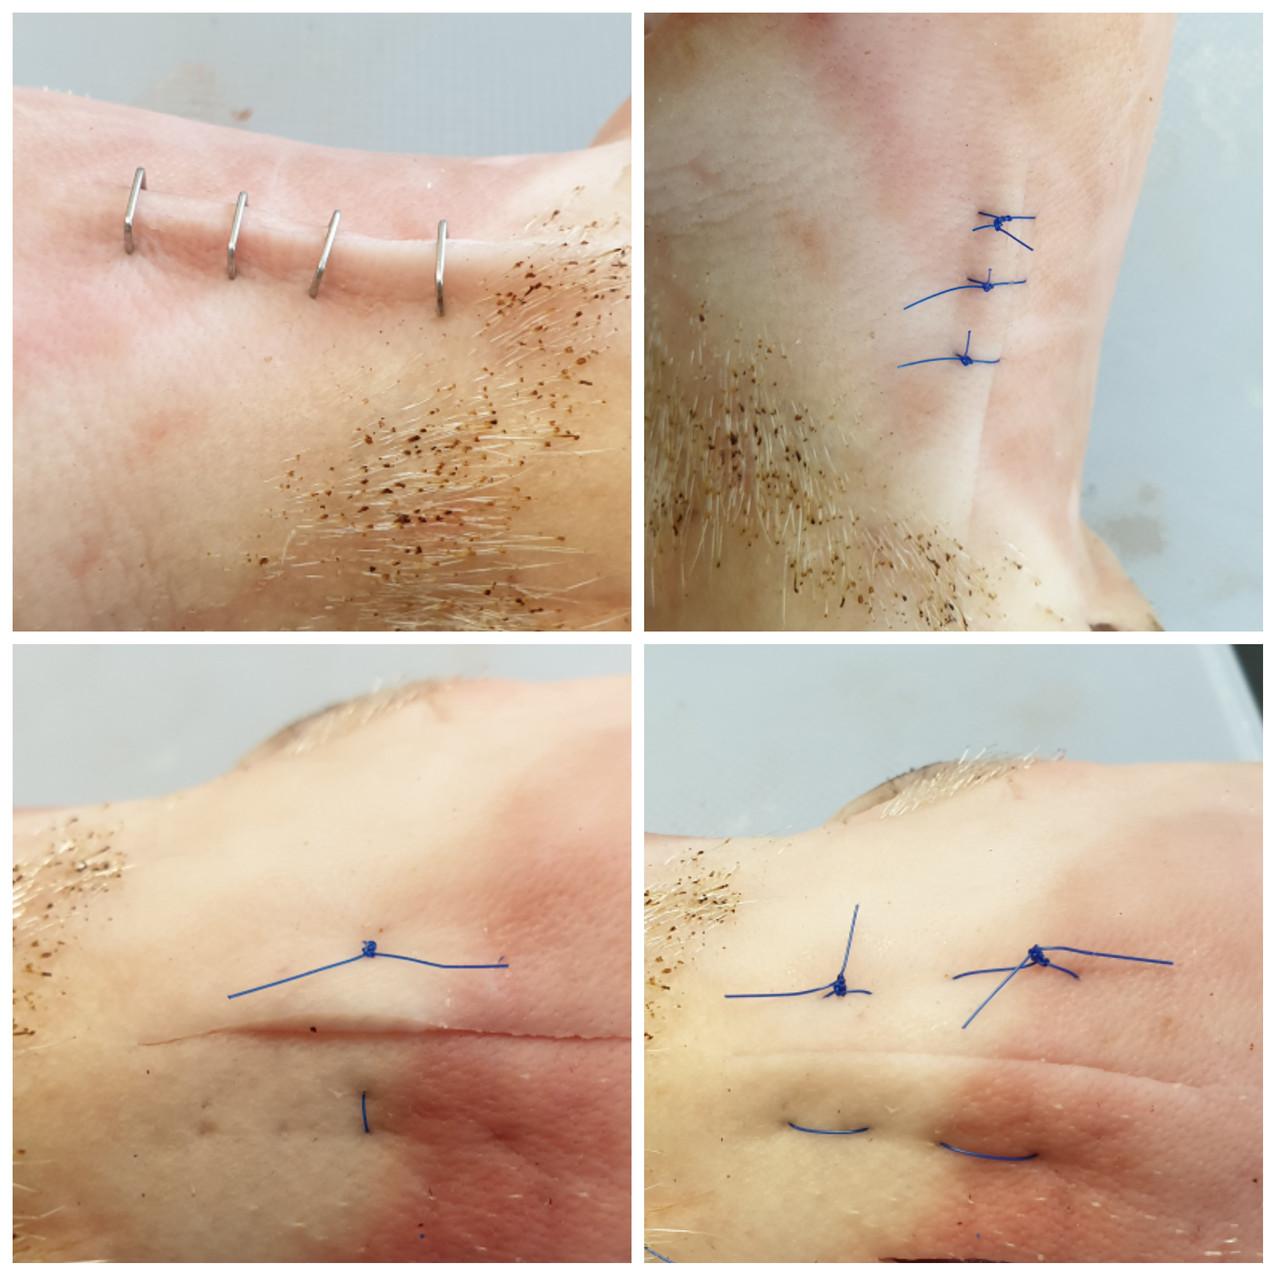 suturing skills